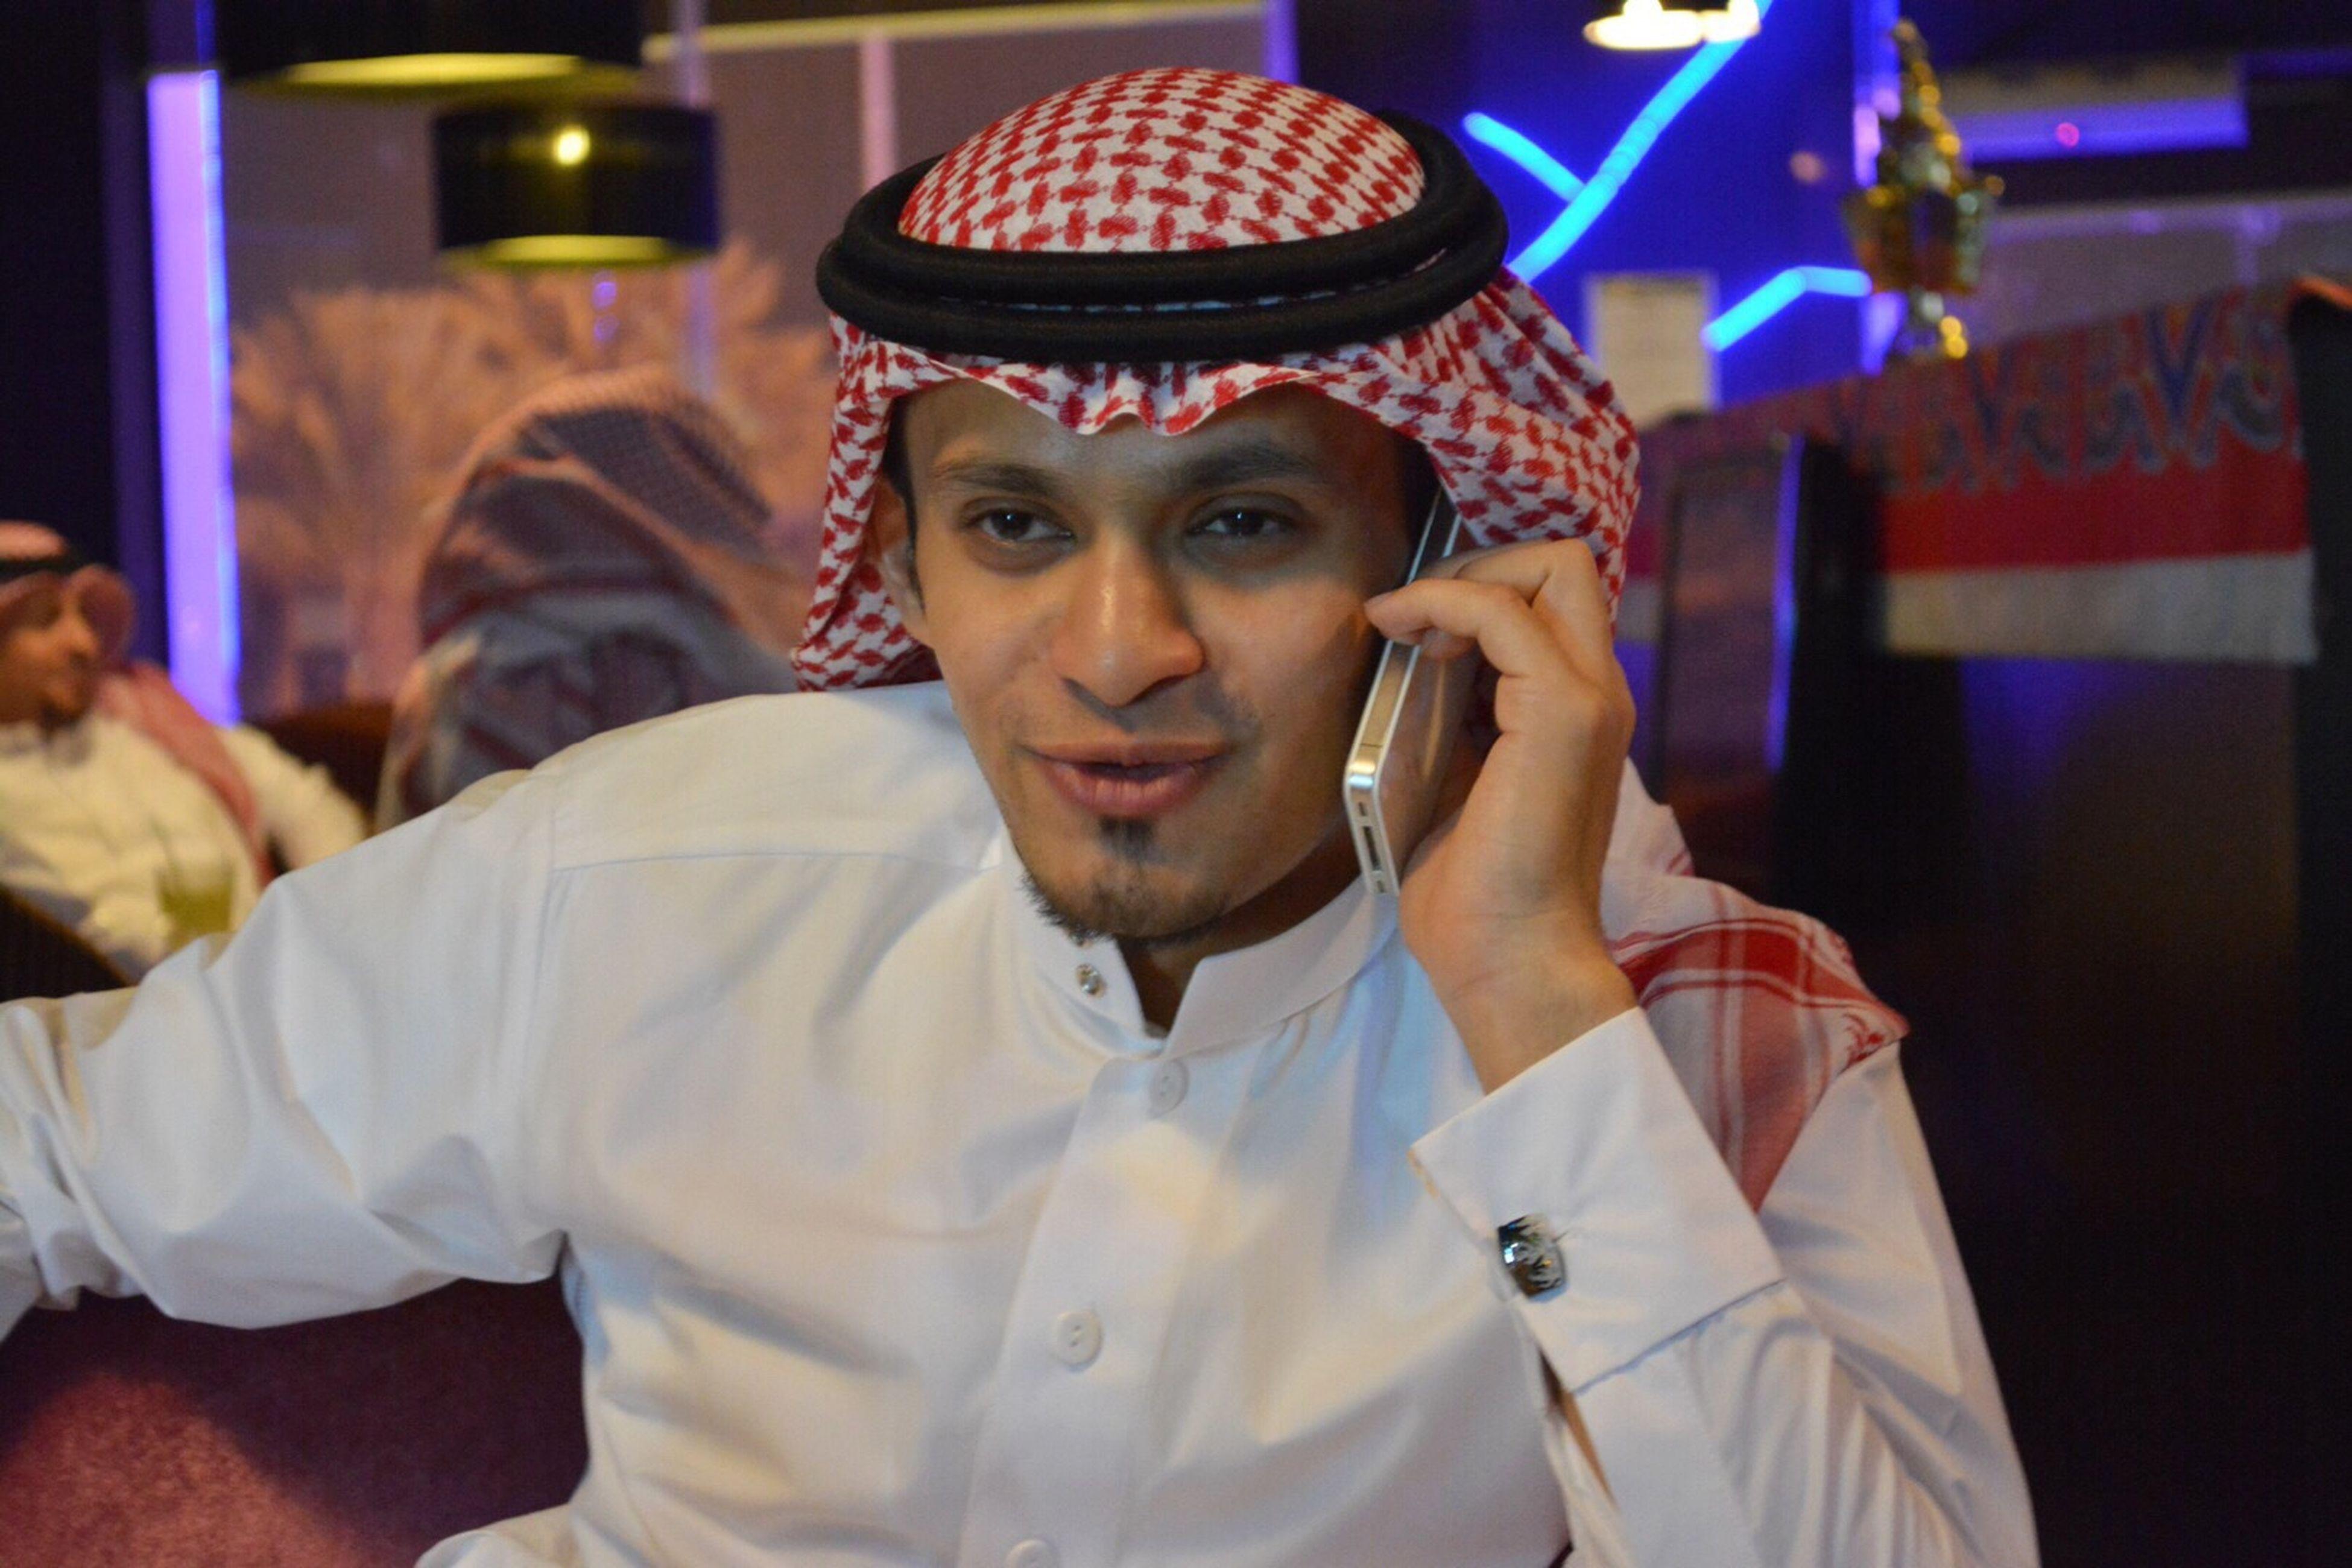 Eid Mubarak Selfie Smile That's Me